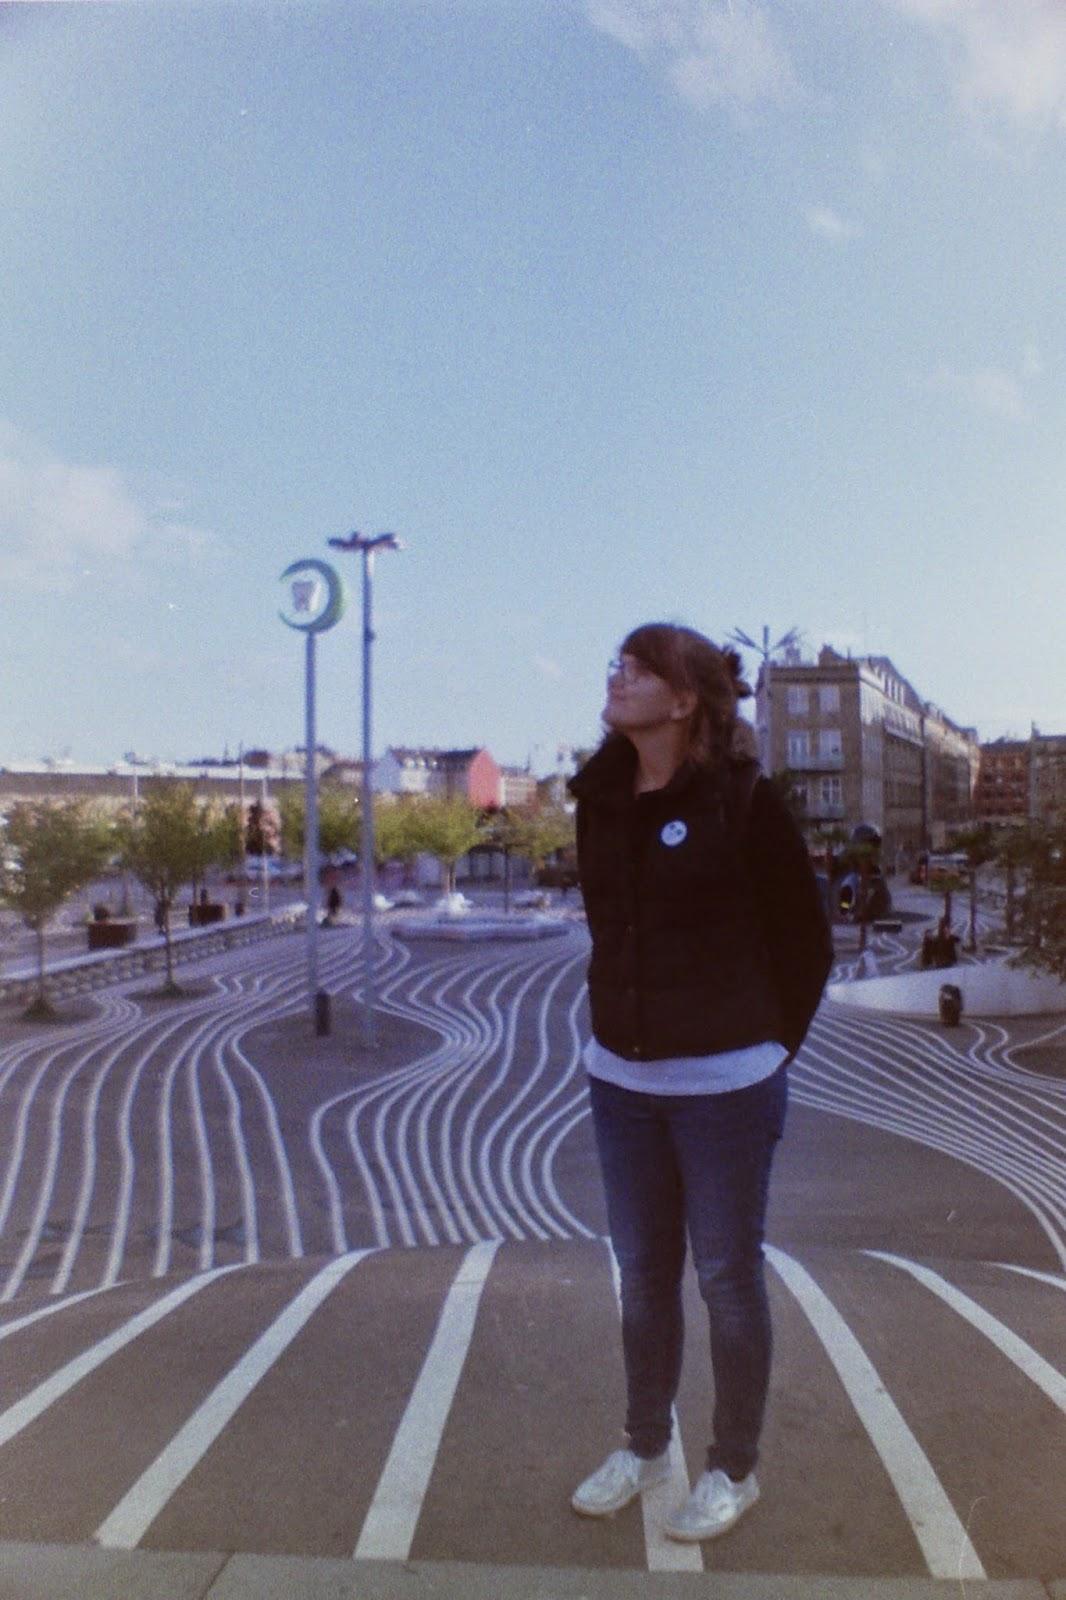 Superkilen, Kopenhagen (Film: DM ISO 400 Kamera: La Sardina)